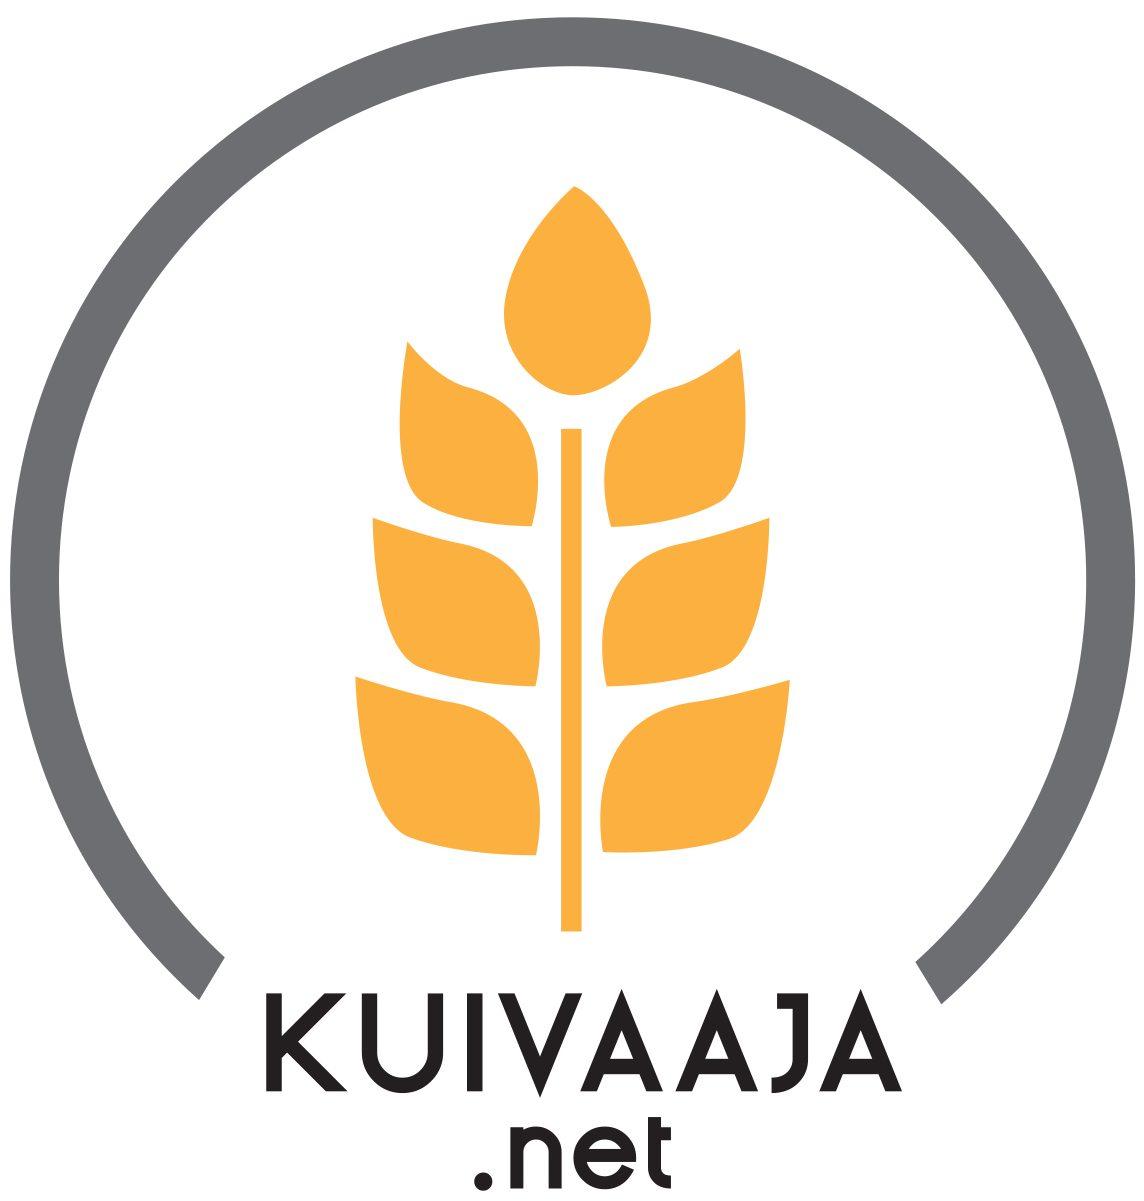 Kuivaaja.net